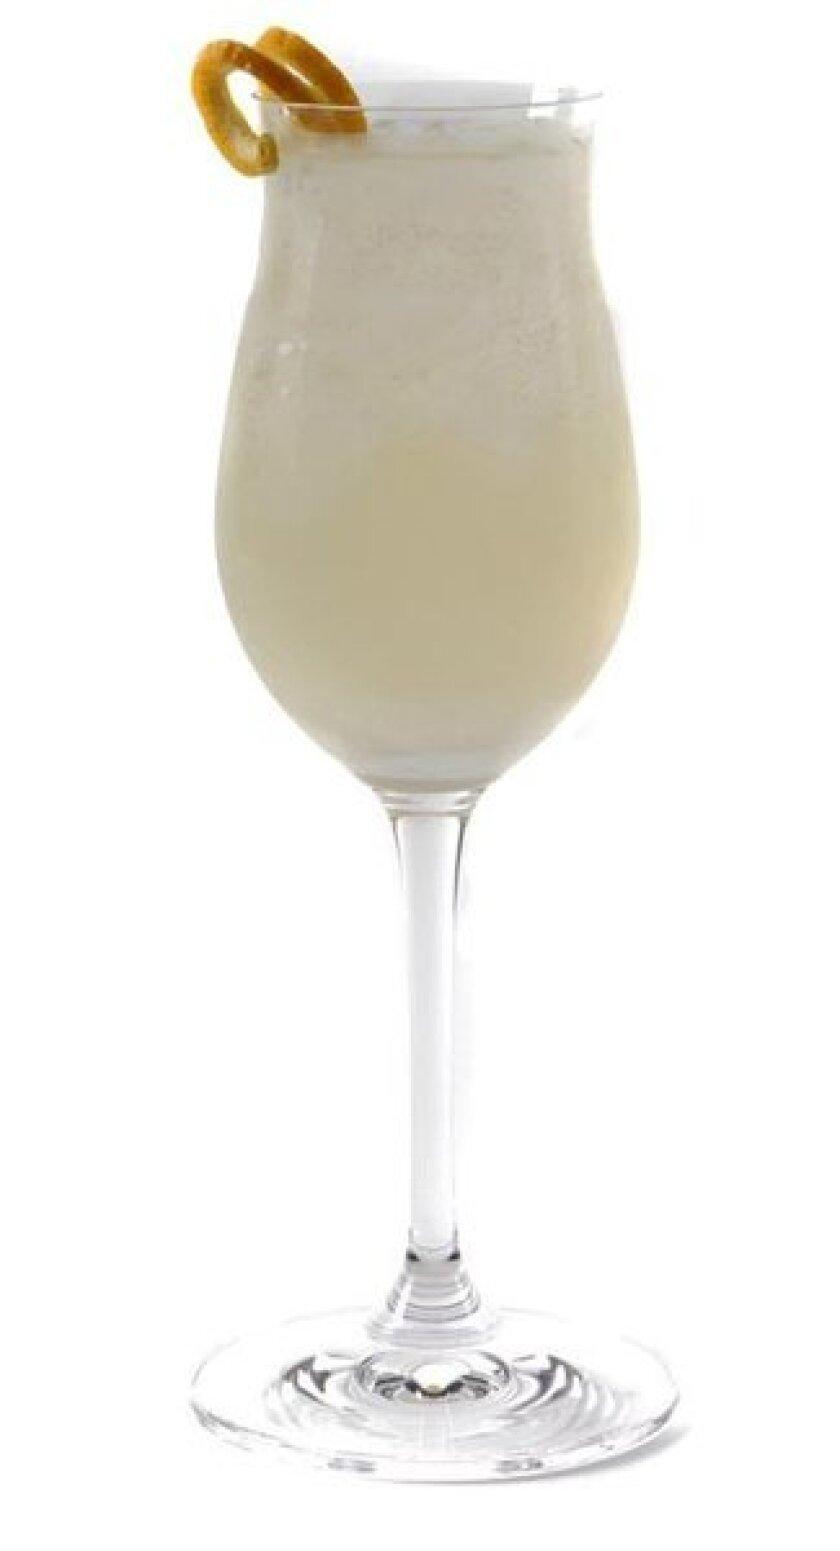 Frozen Rose cocktail